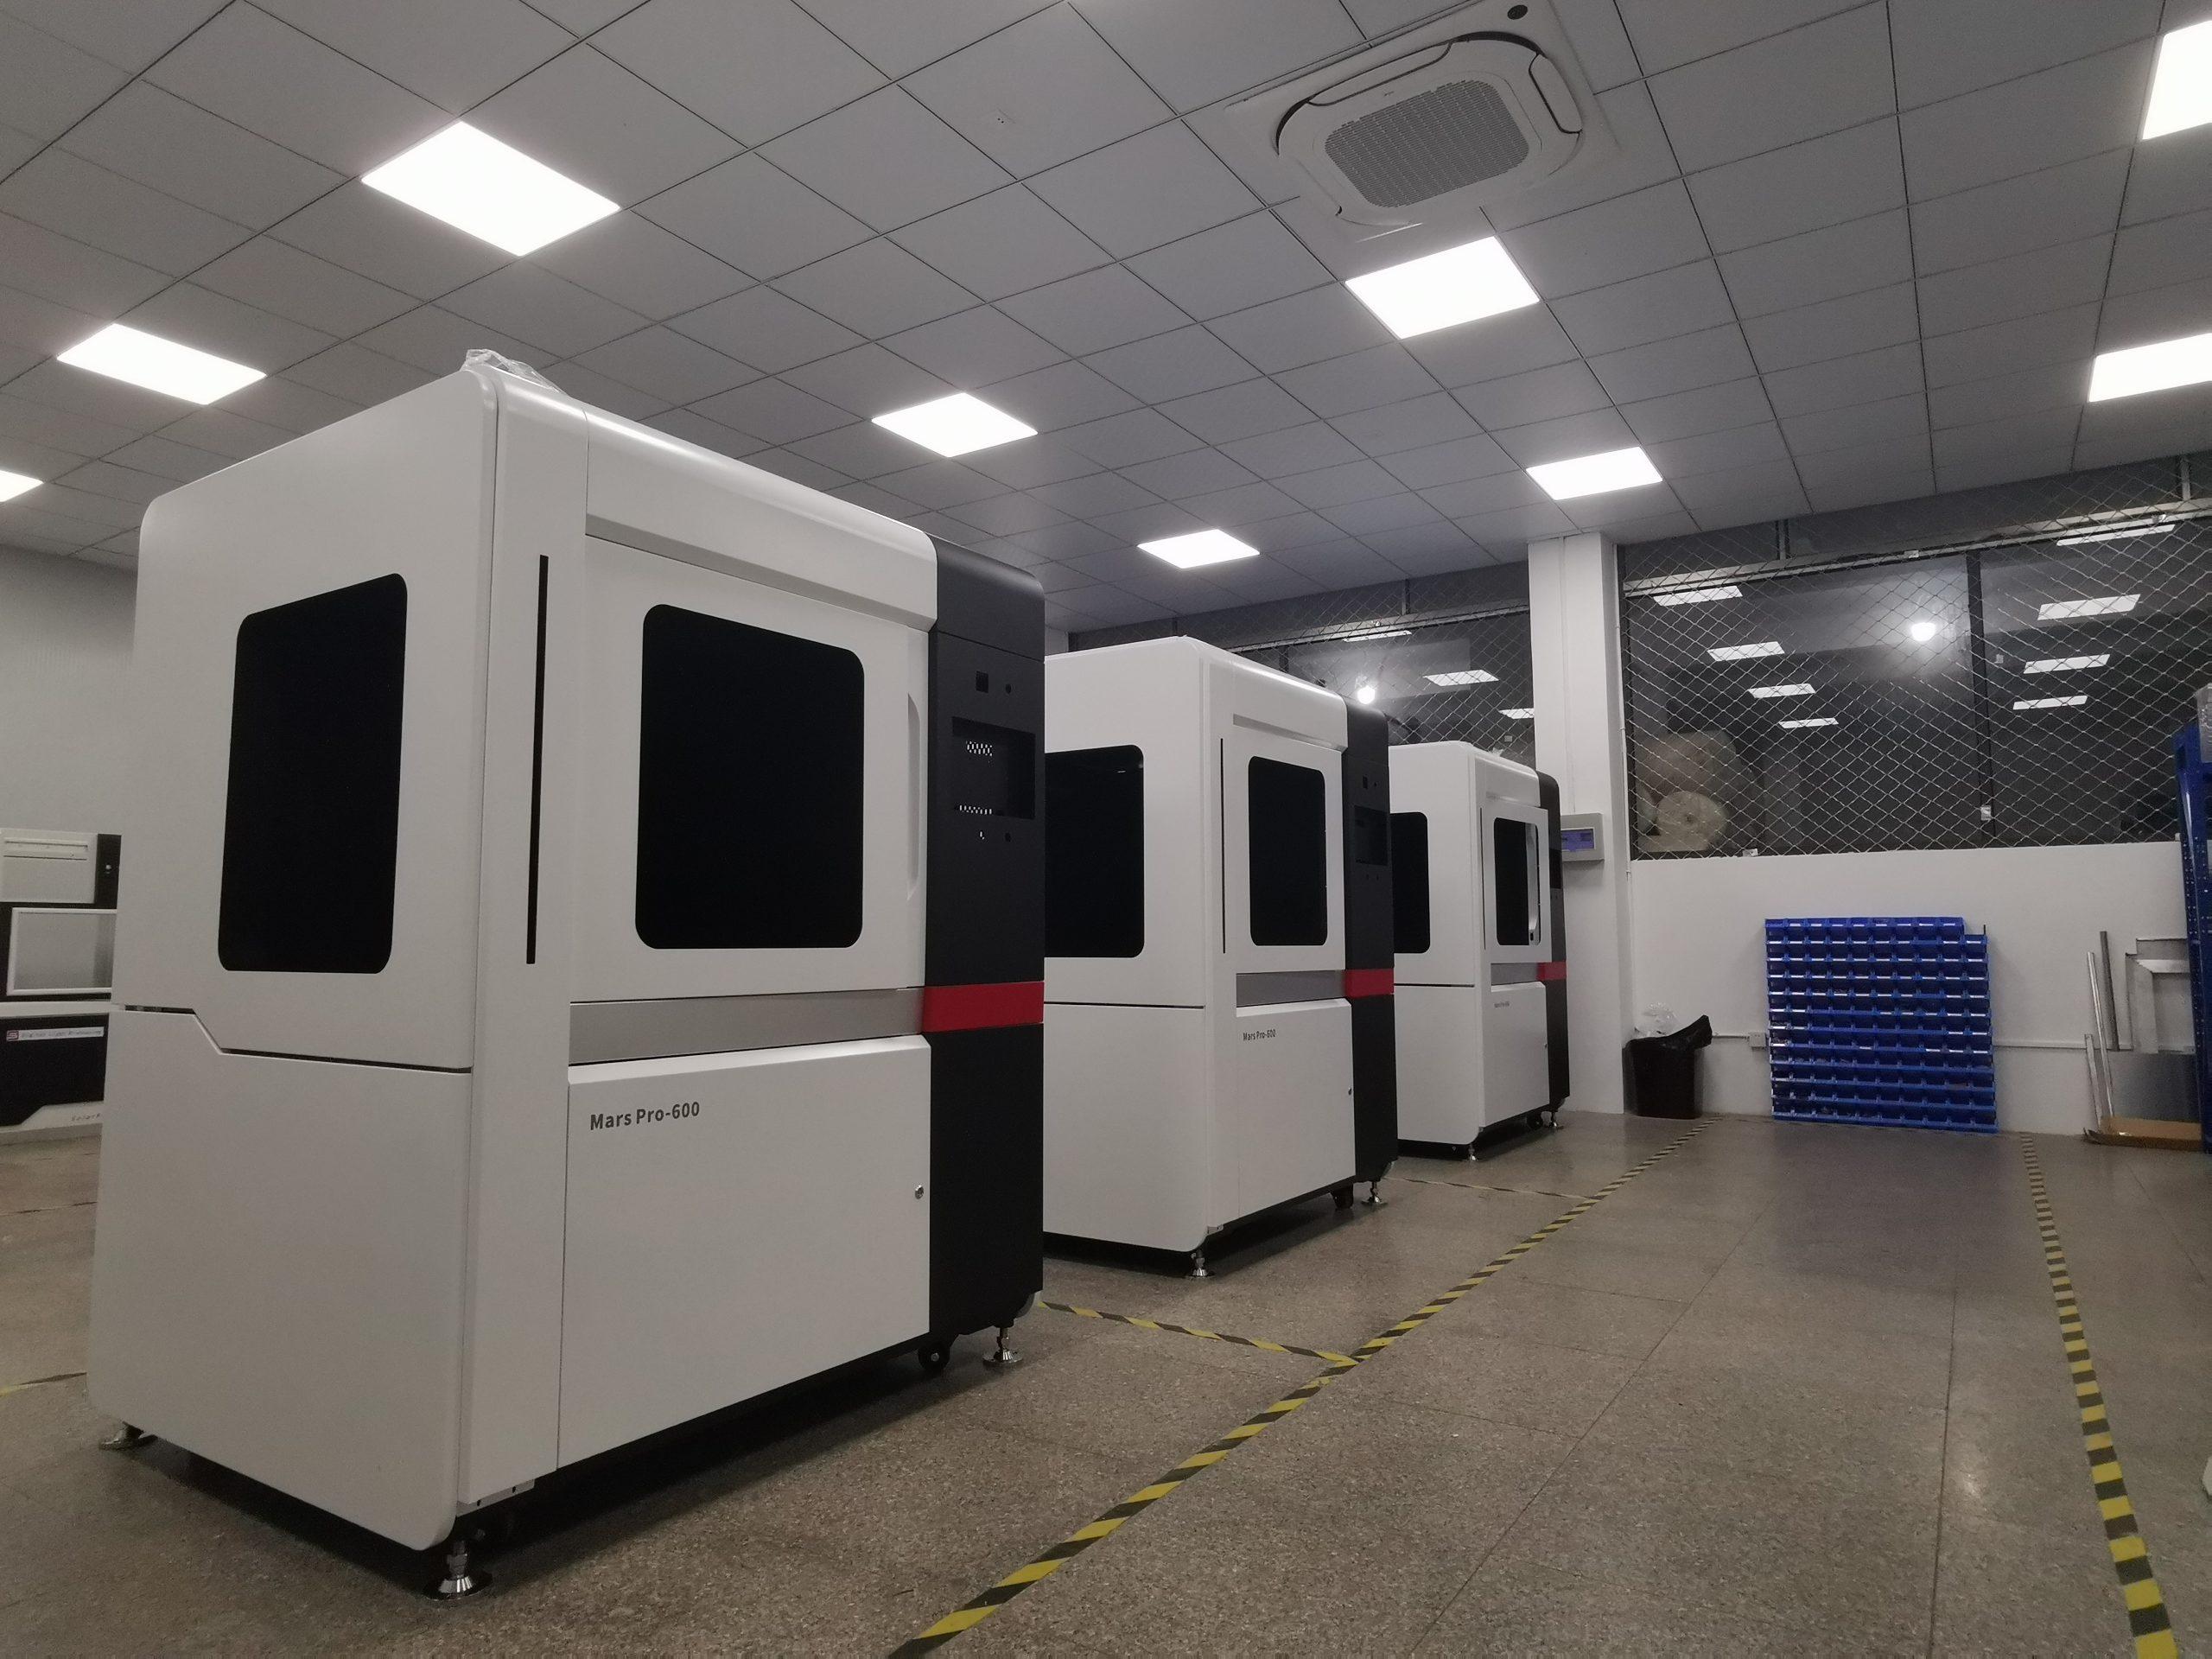 The Mars Pro 3D printer series. Photo via SoonSolid.